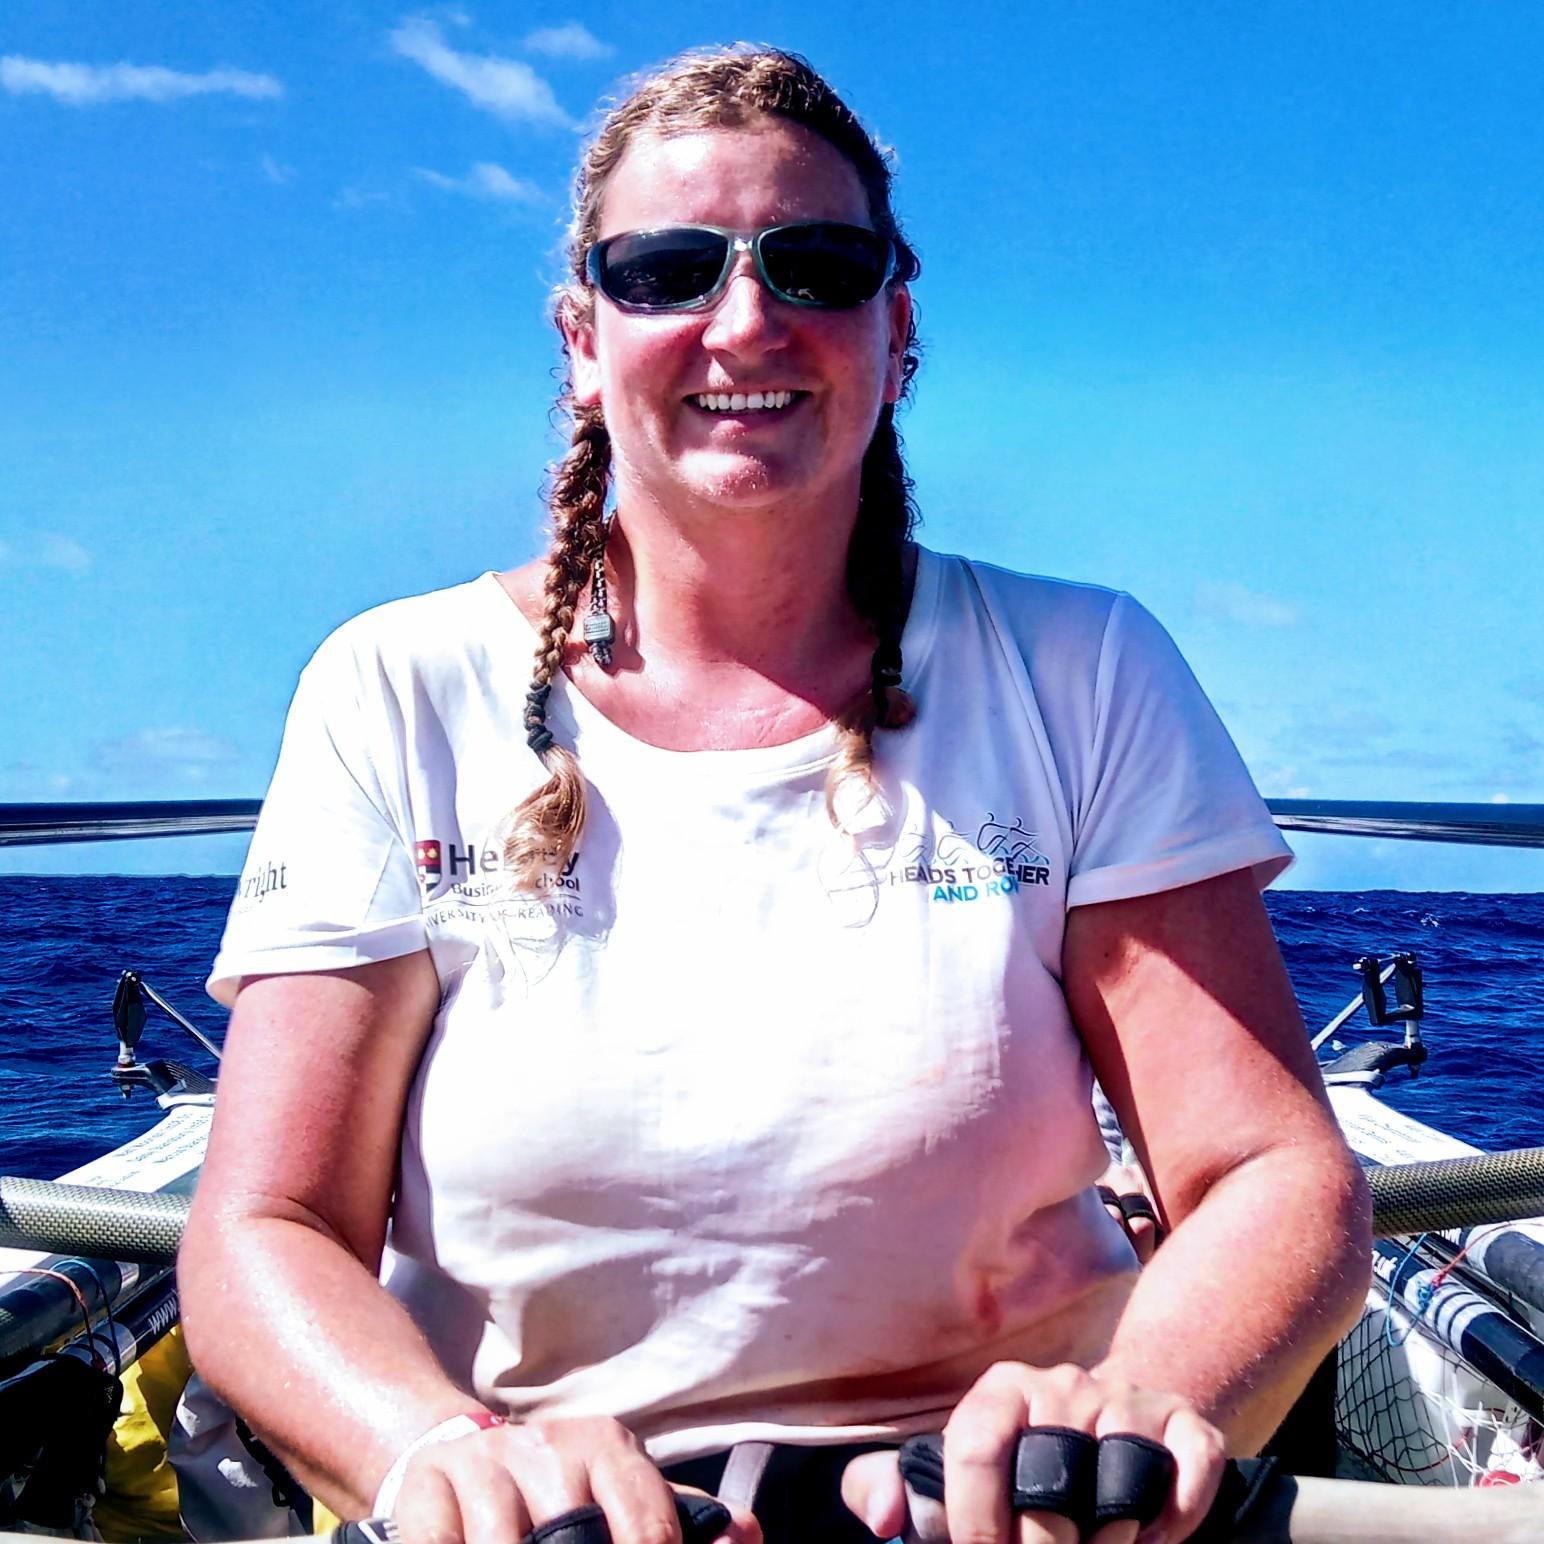 Rower's Atlantic challenge